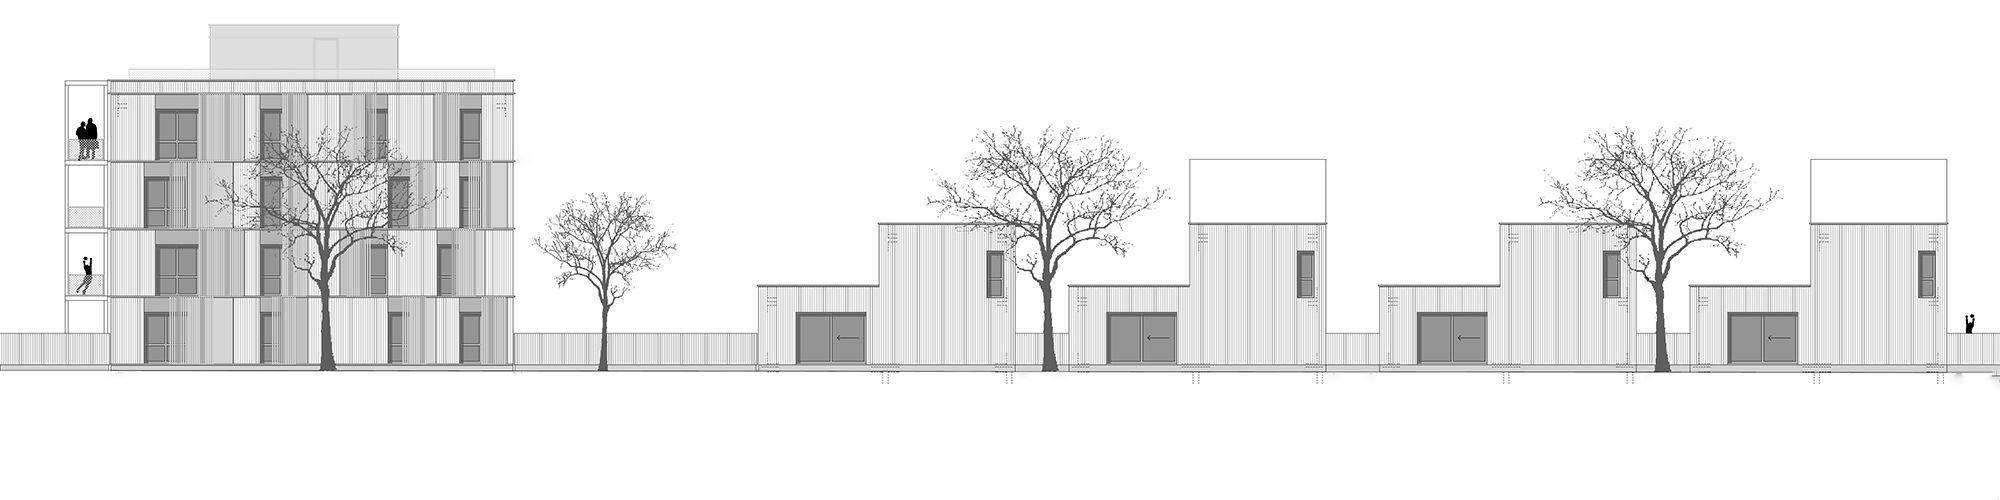 Rendering Baufeld WA 16 Ost © dressler mayerhofer roessler architekten und stadtplaner